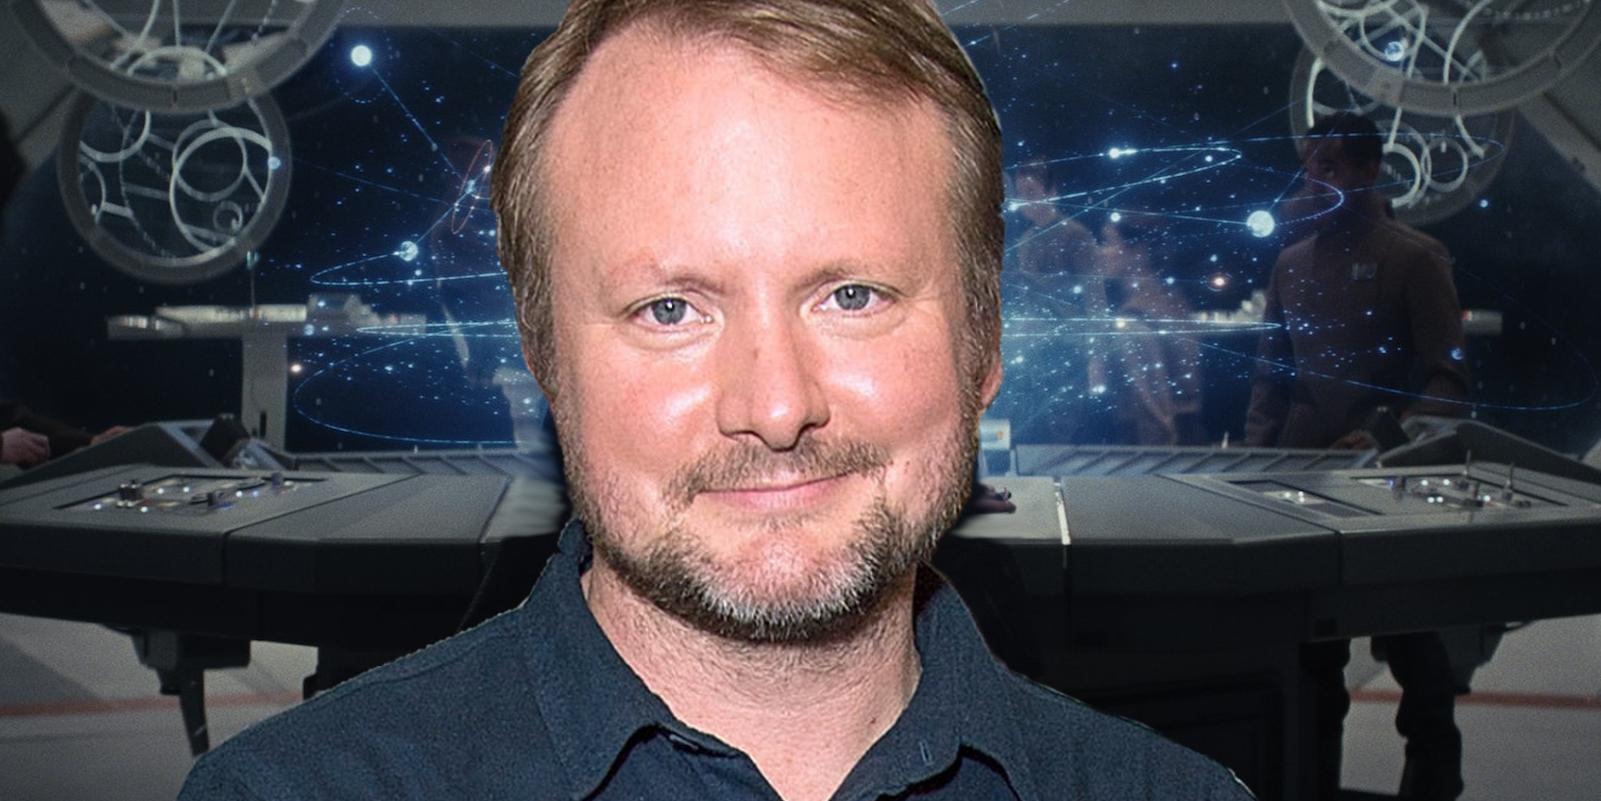 Work Has Already Begun on Rian Johnson's New Star Wars Trilogy